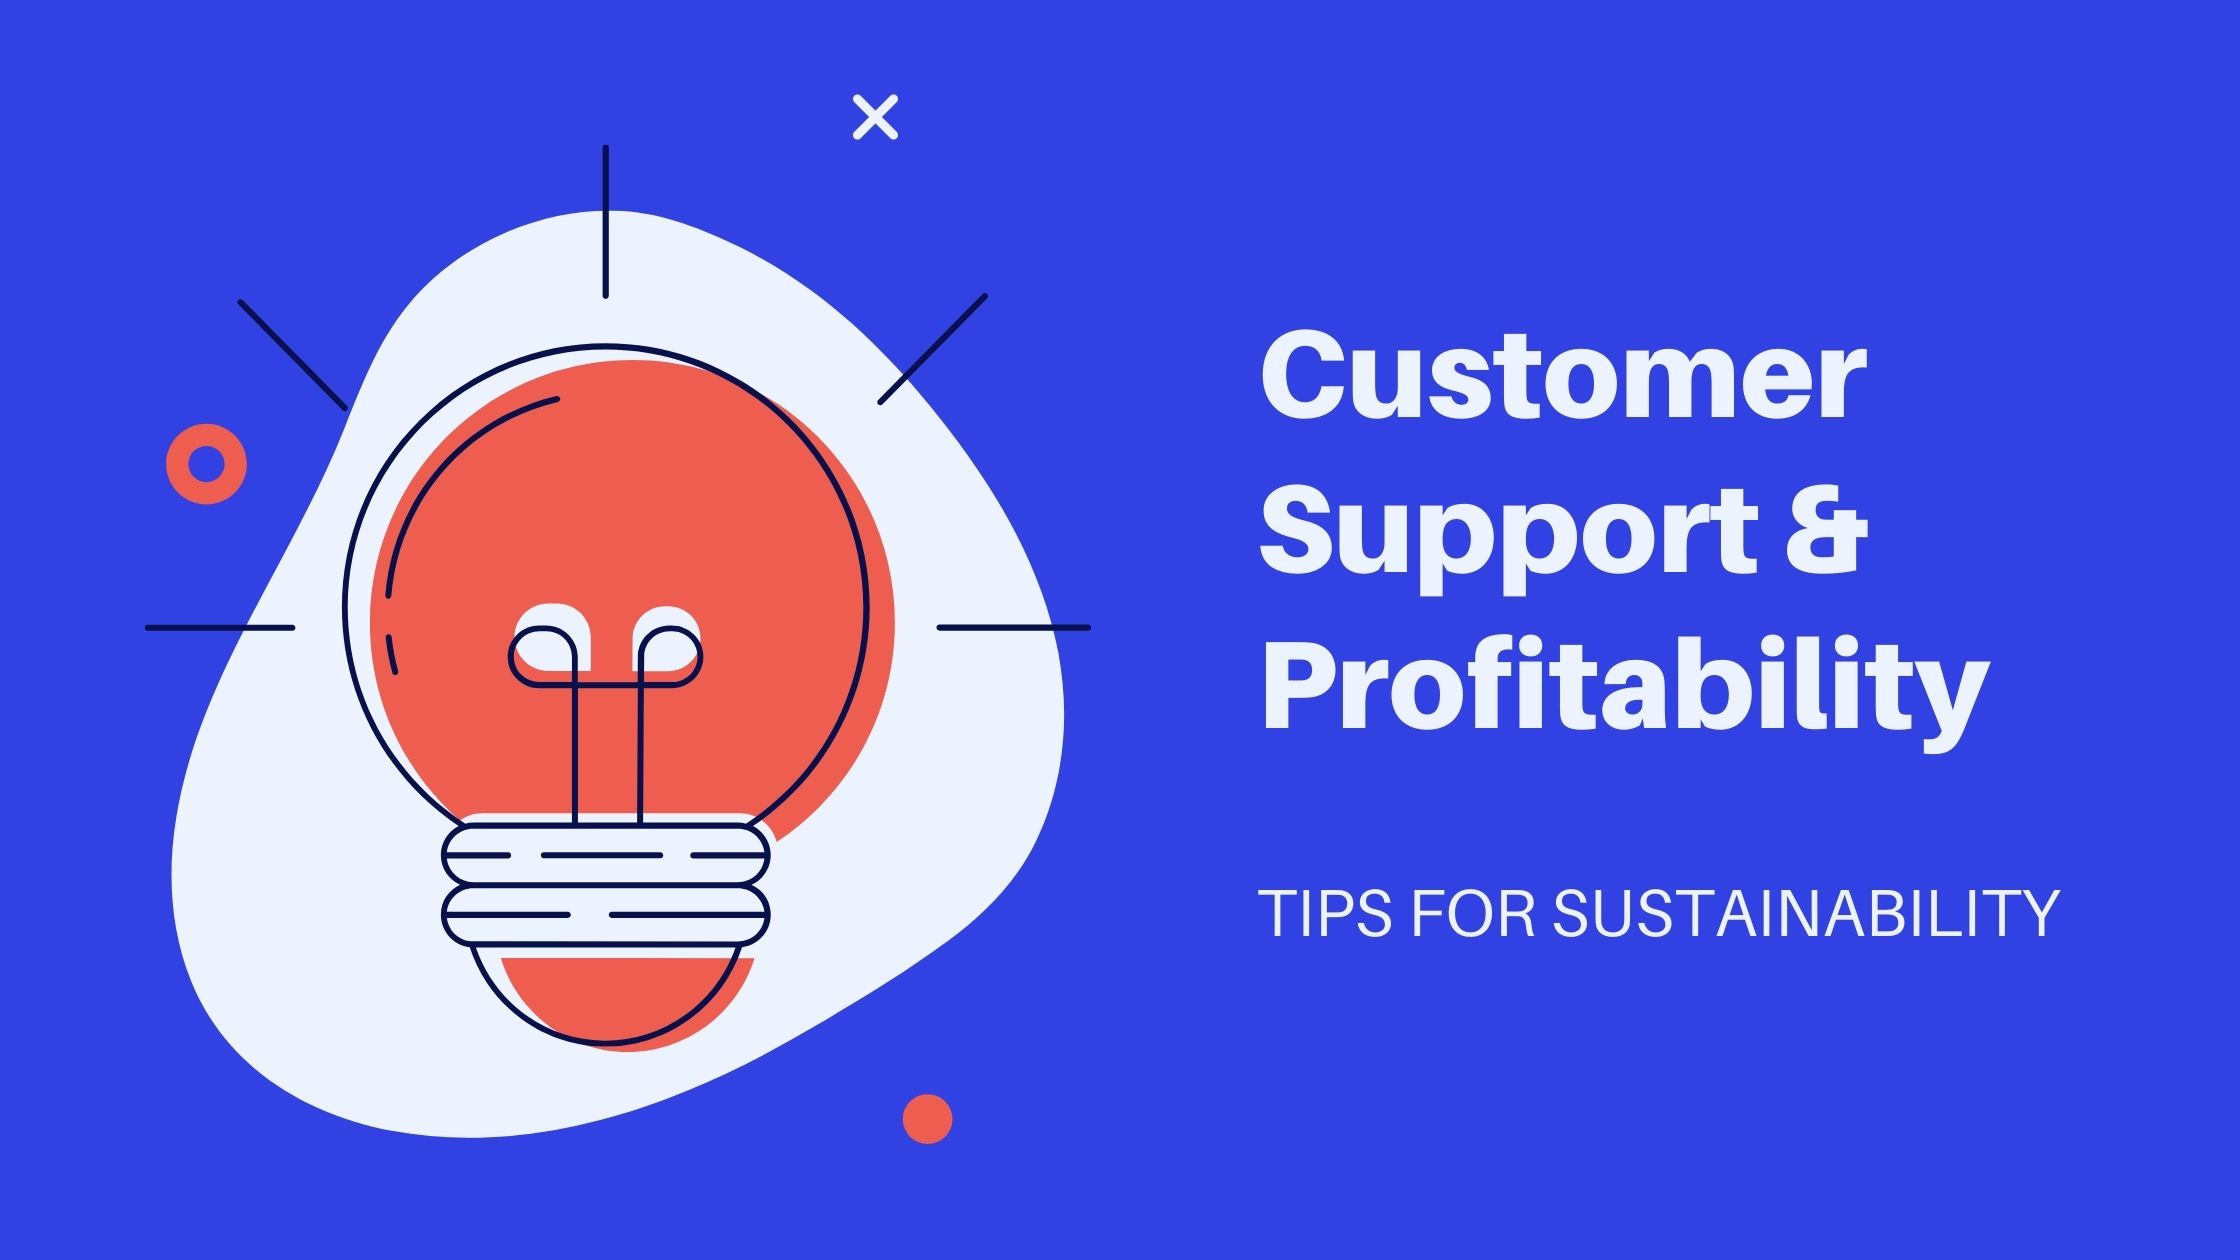 Customer Support & Profitability